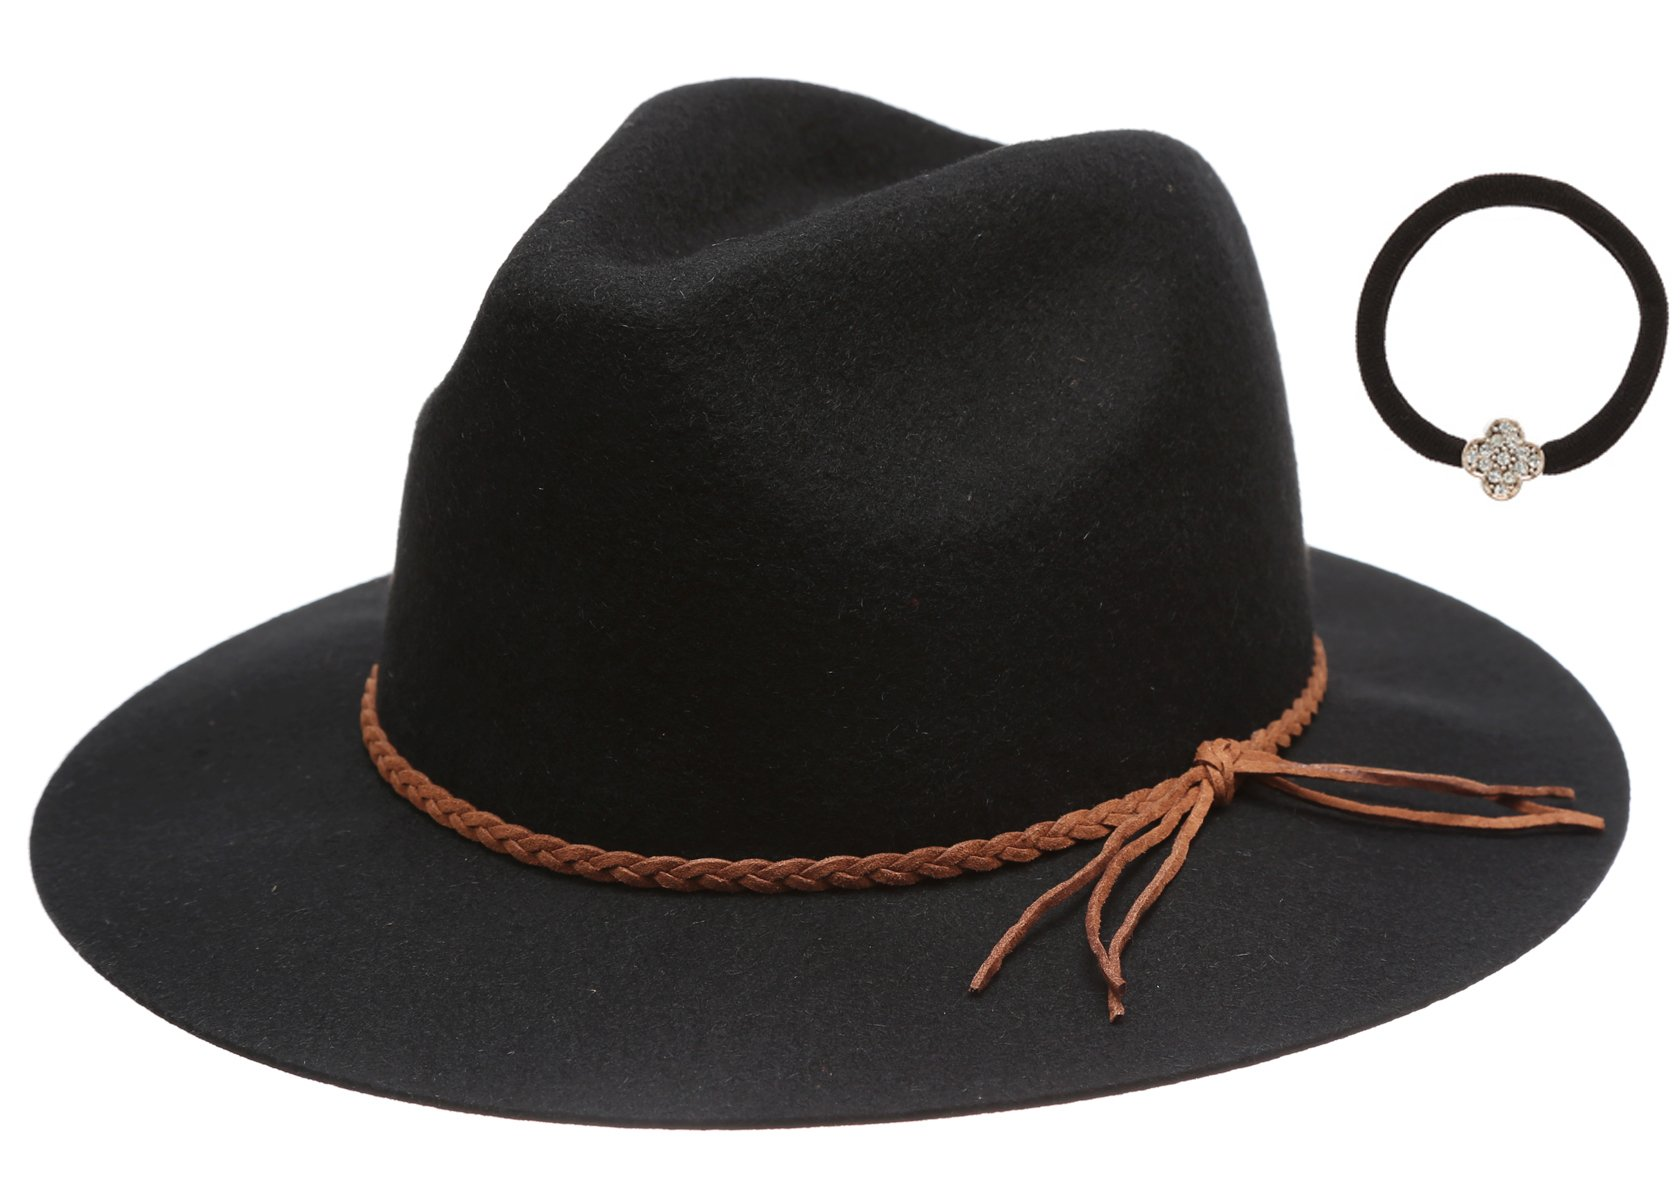 Women's 100% Wool Felt Cloche Short Brim Floppy Fedora Hat with Scrunchy (Braid Black)